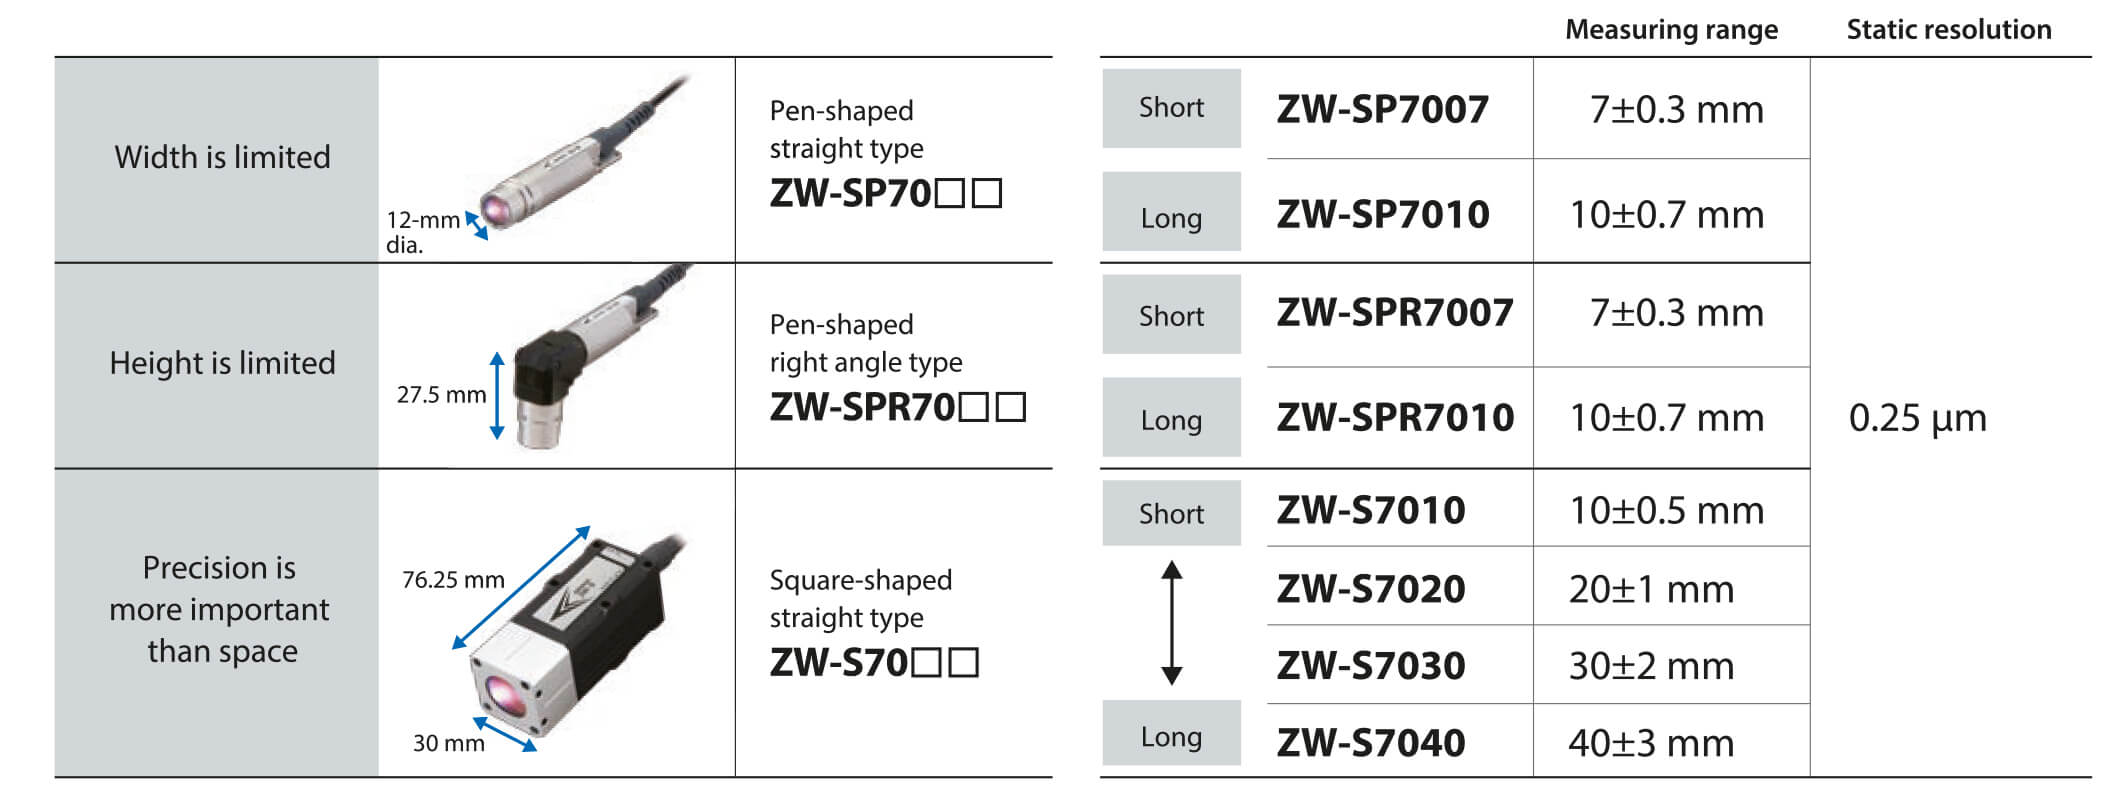 sensor controller zw-7000t table en prod